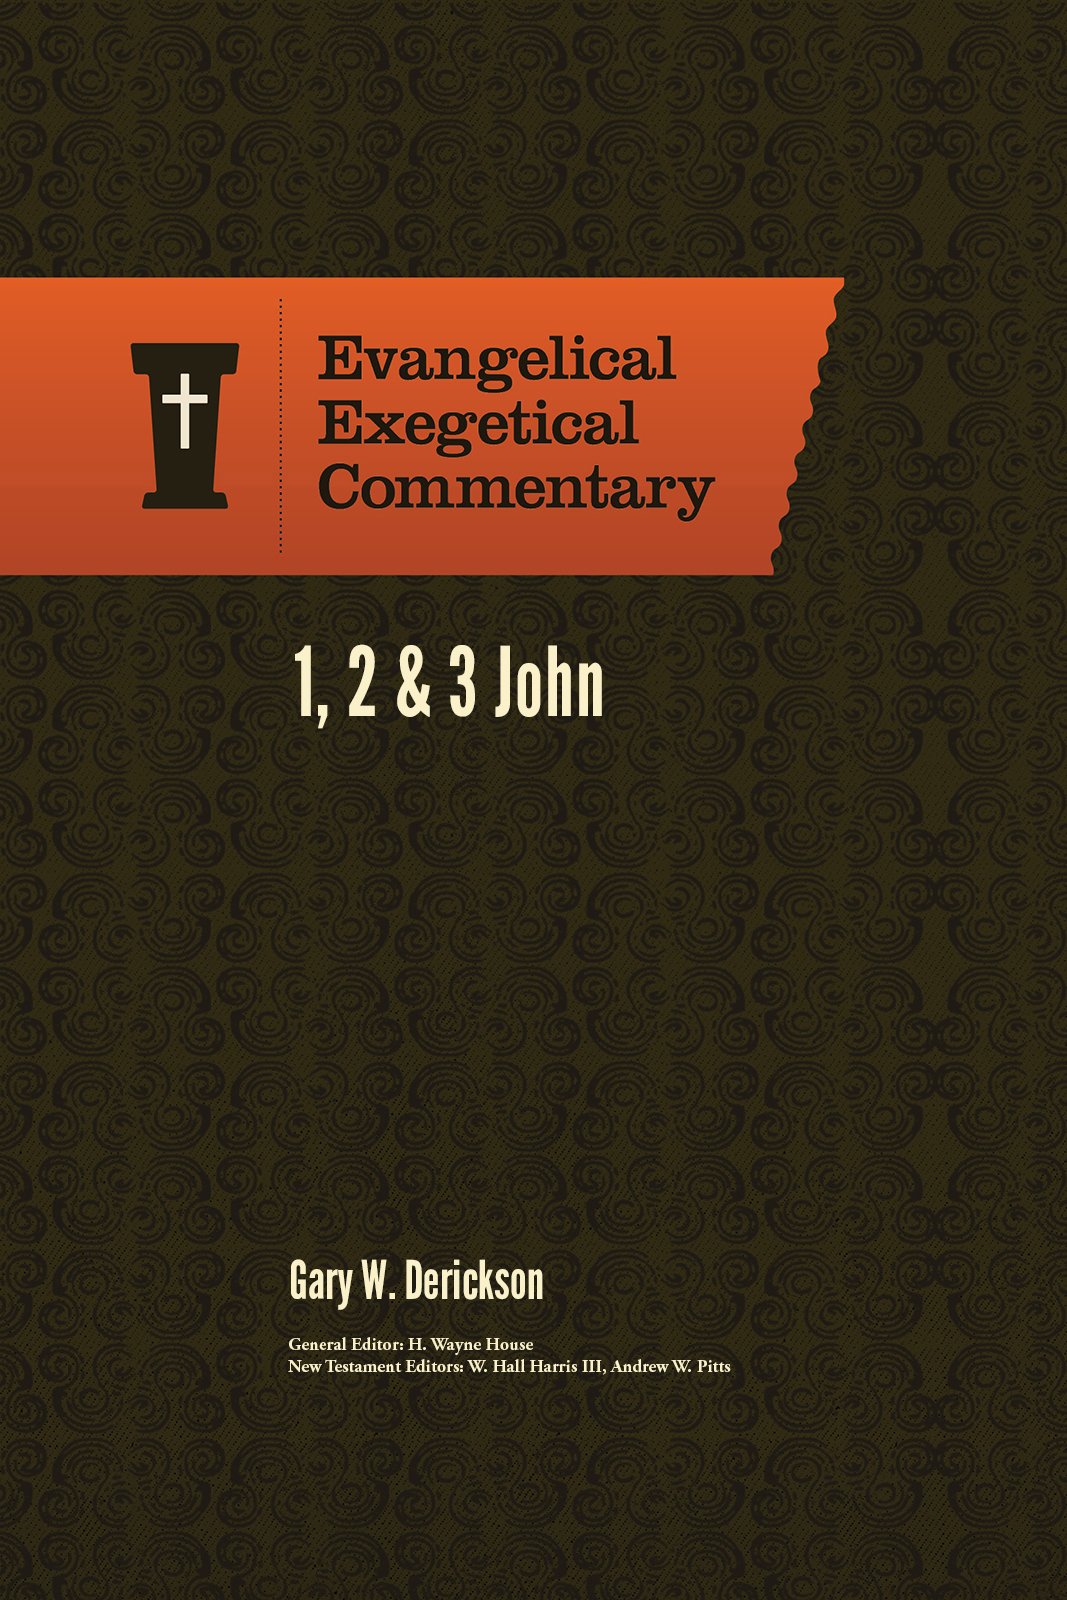 1, 2, & 3 John: Evangelical Exegetical Commentary (EEC)